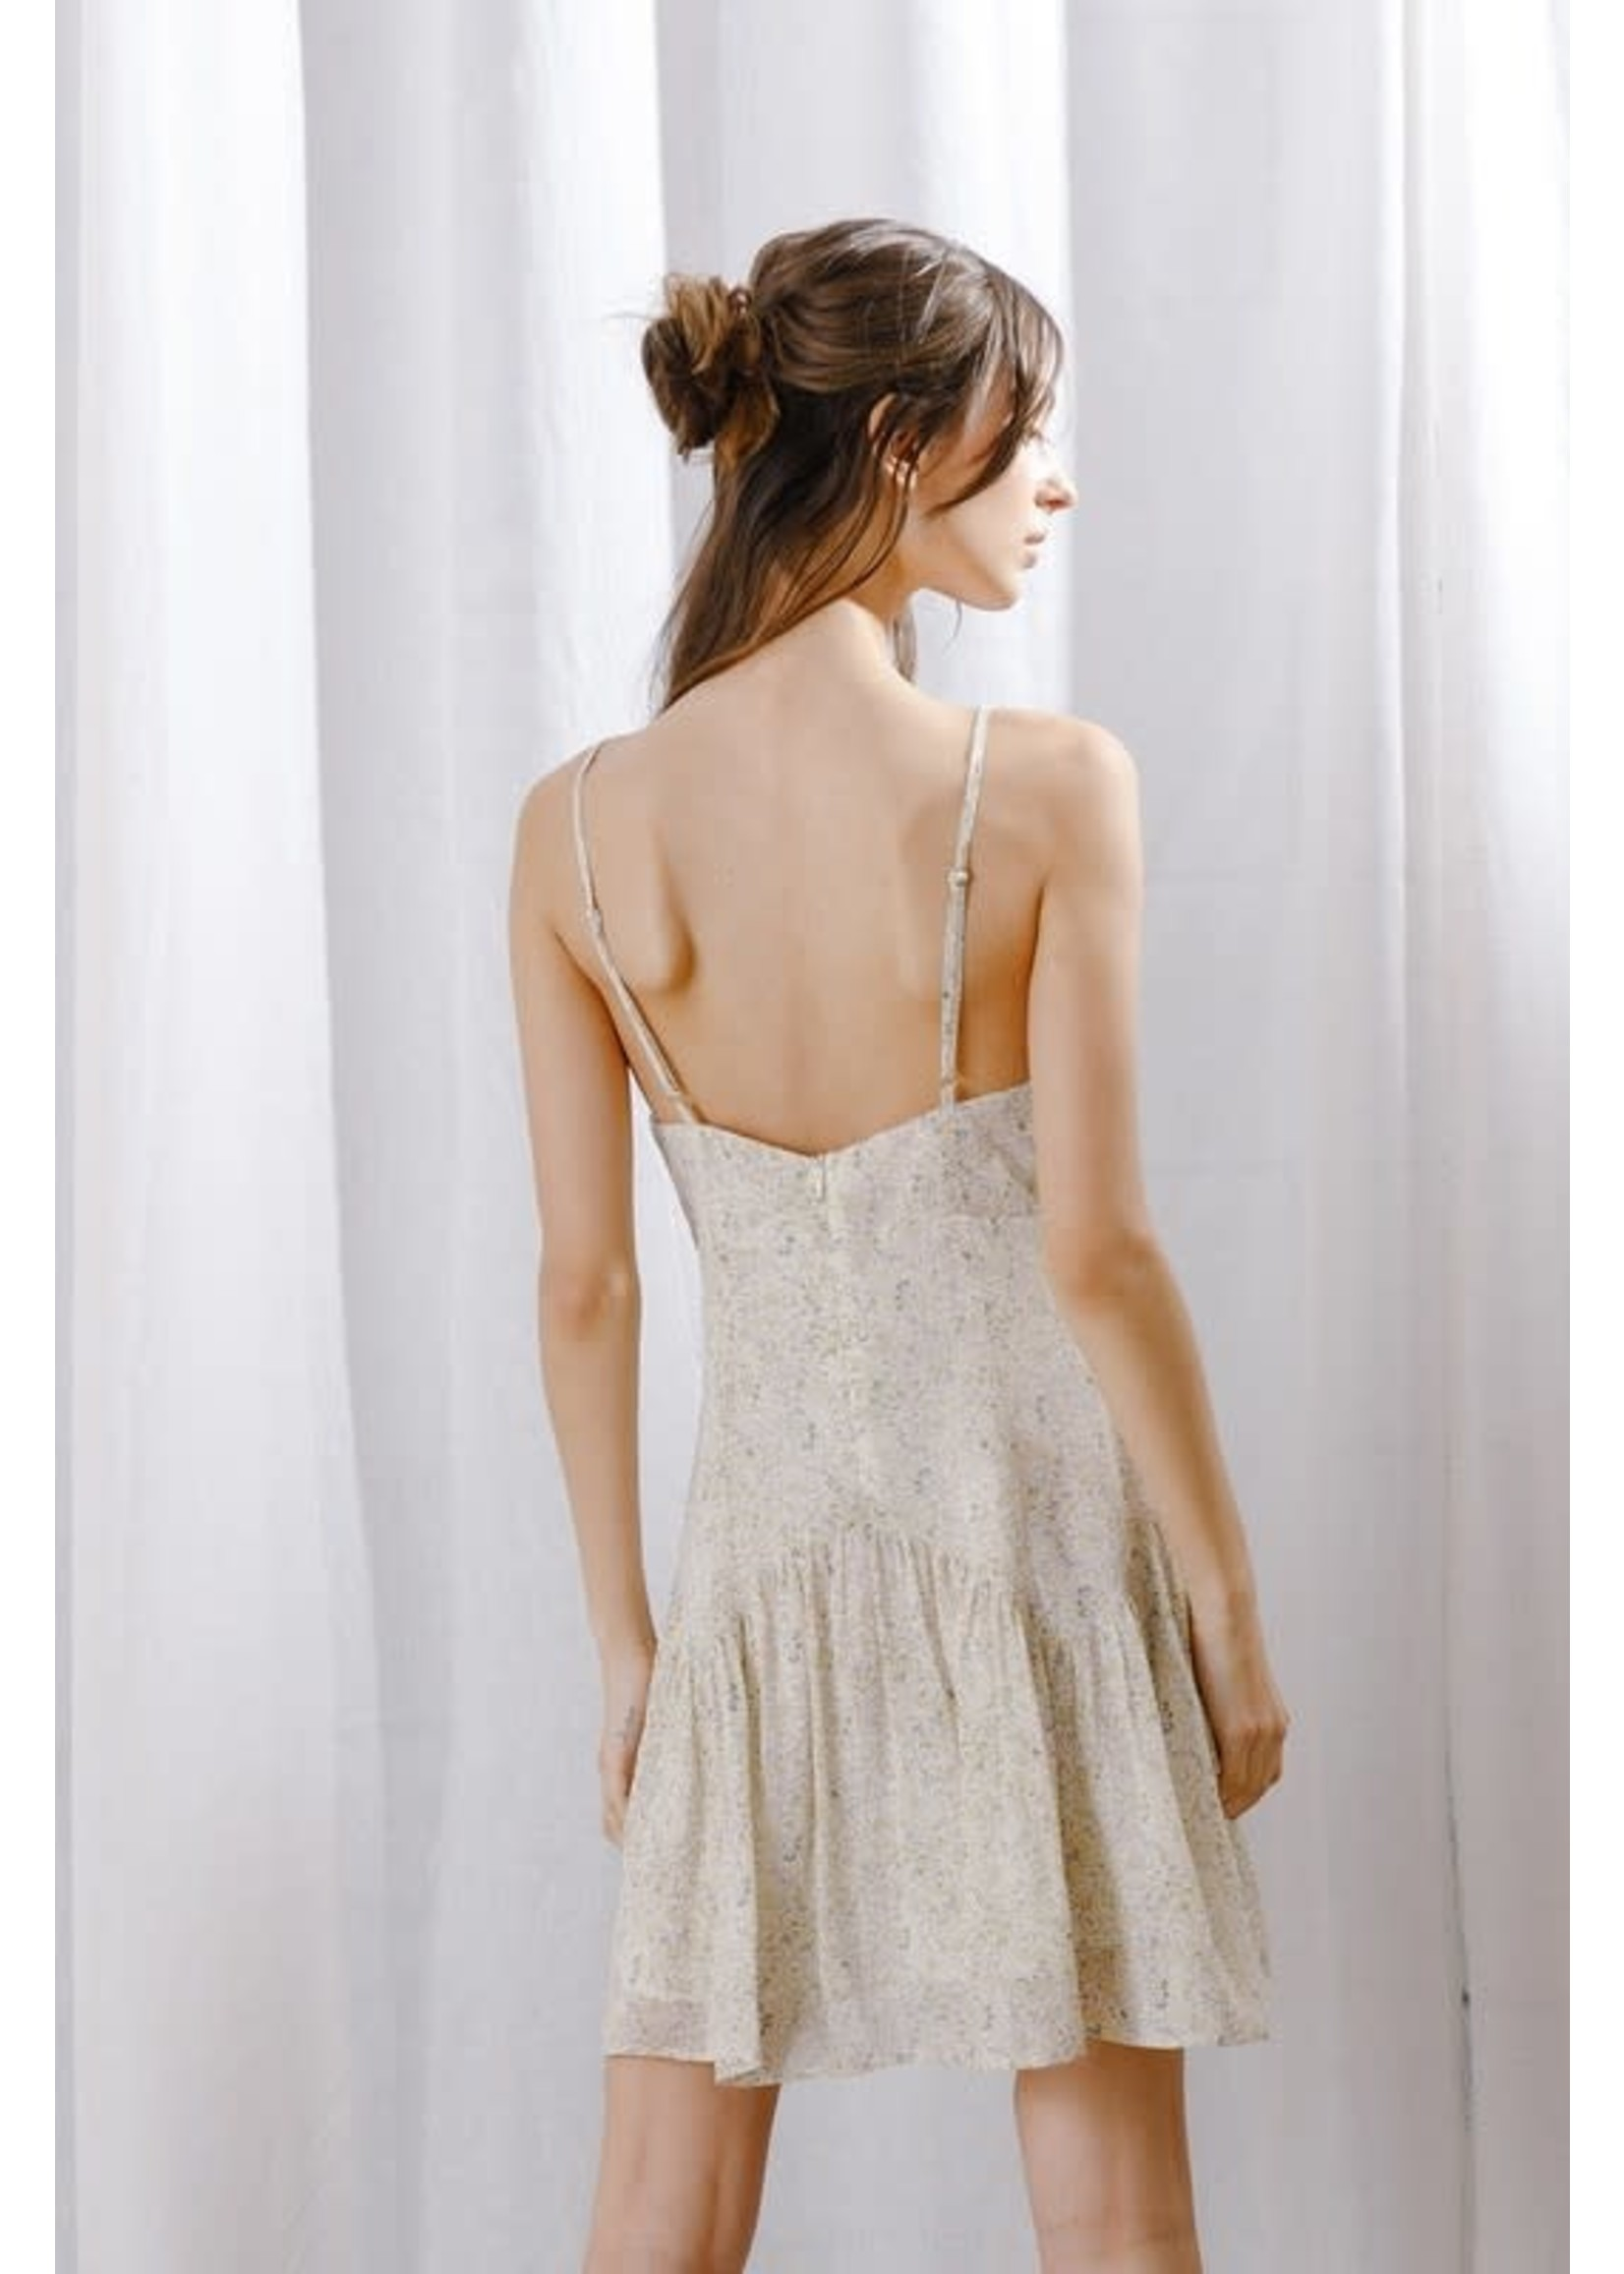 Storia Roses Sweetheart Mini Dress - SD2502C